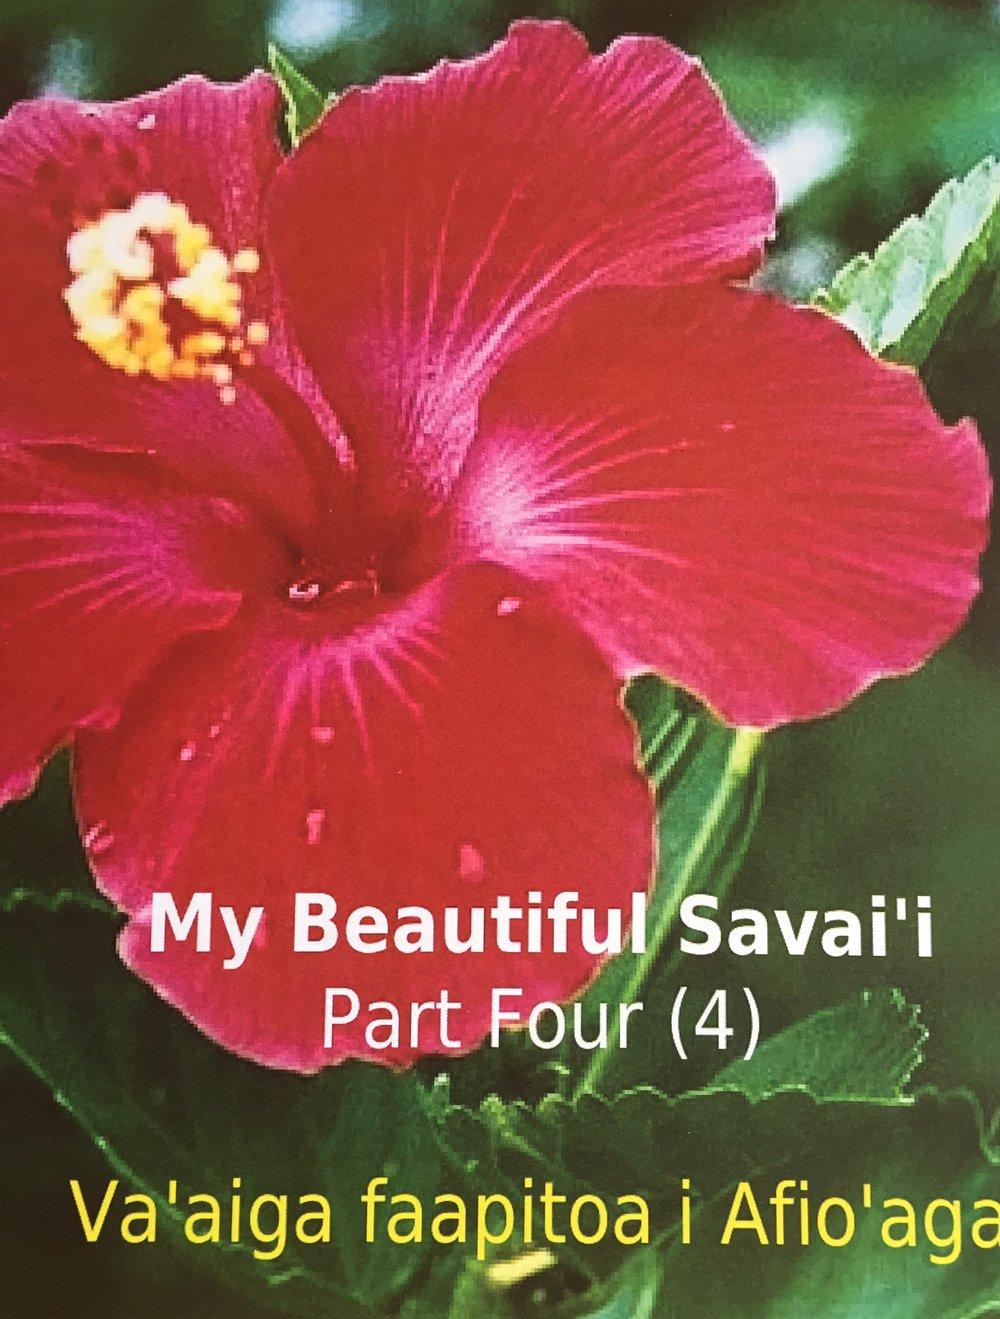 Image of My Beautiful Savaii 3